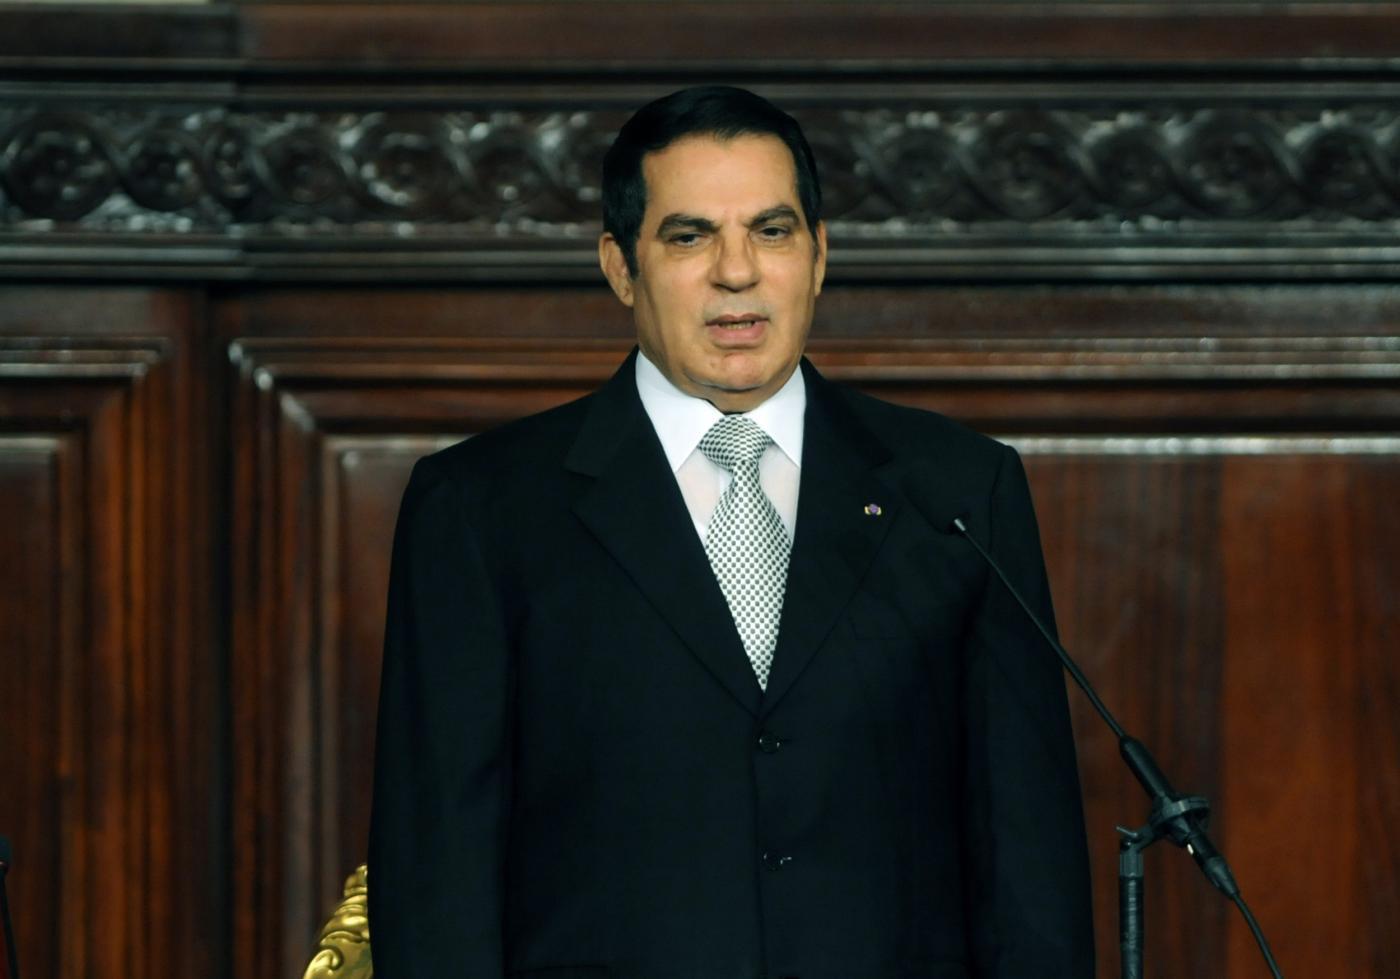 Former Tunisian leader Ben Ali dies in exile